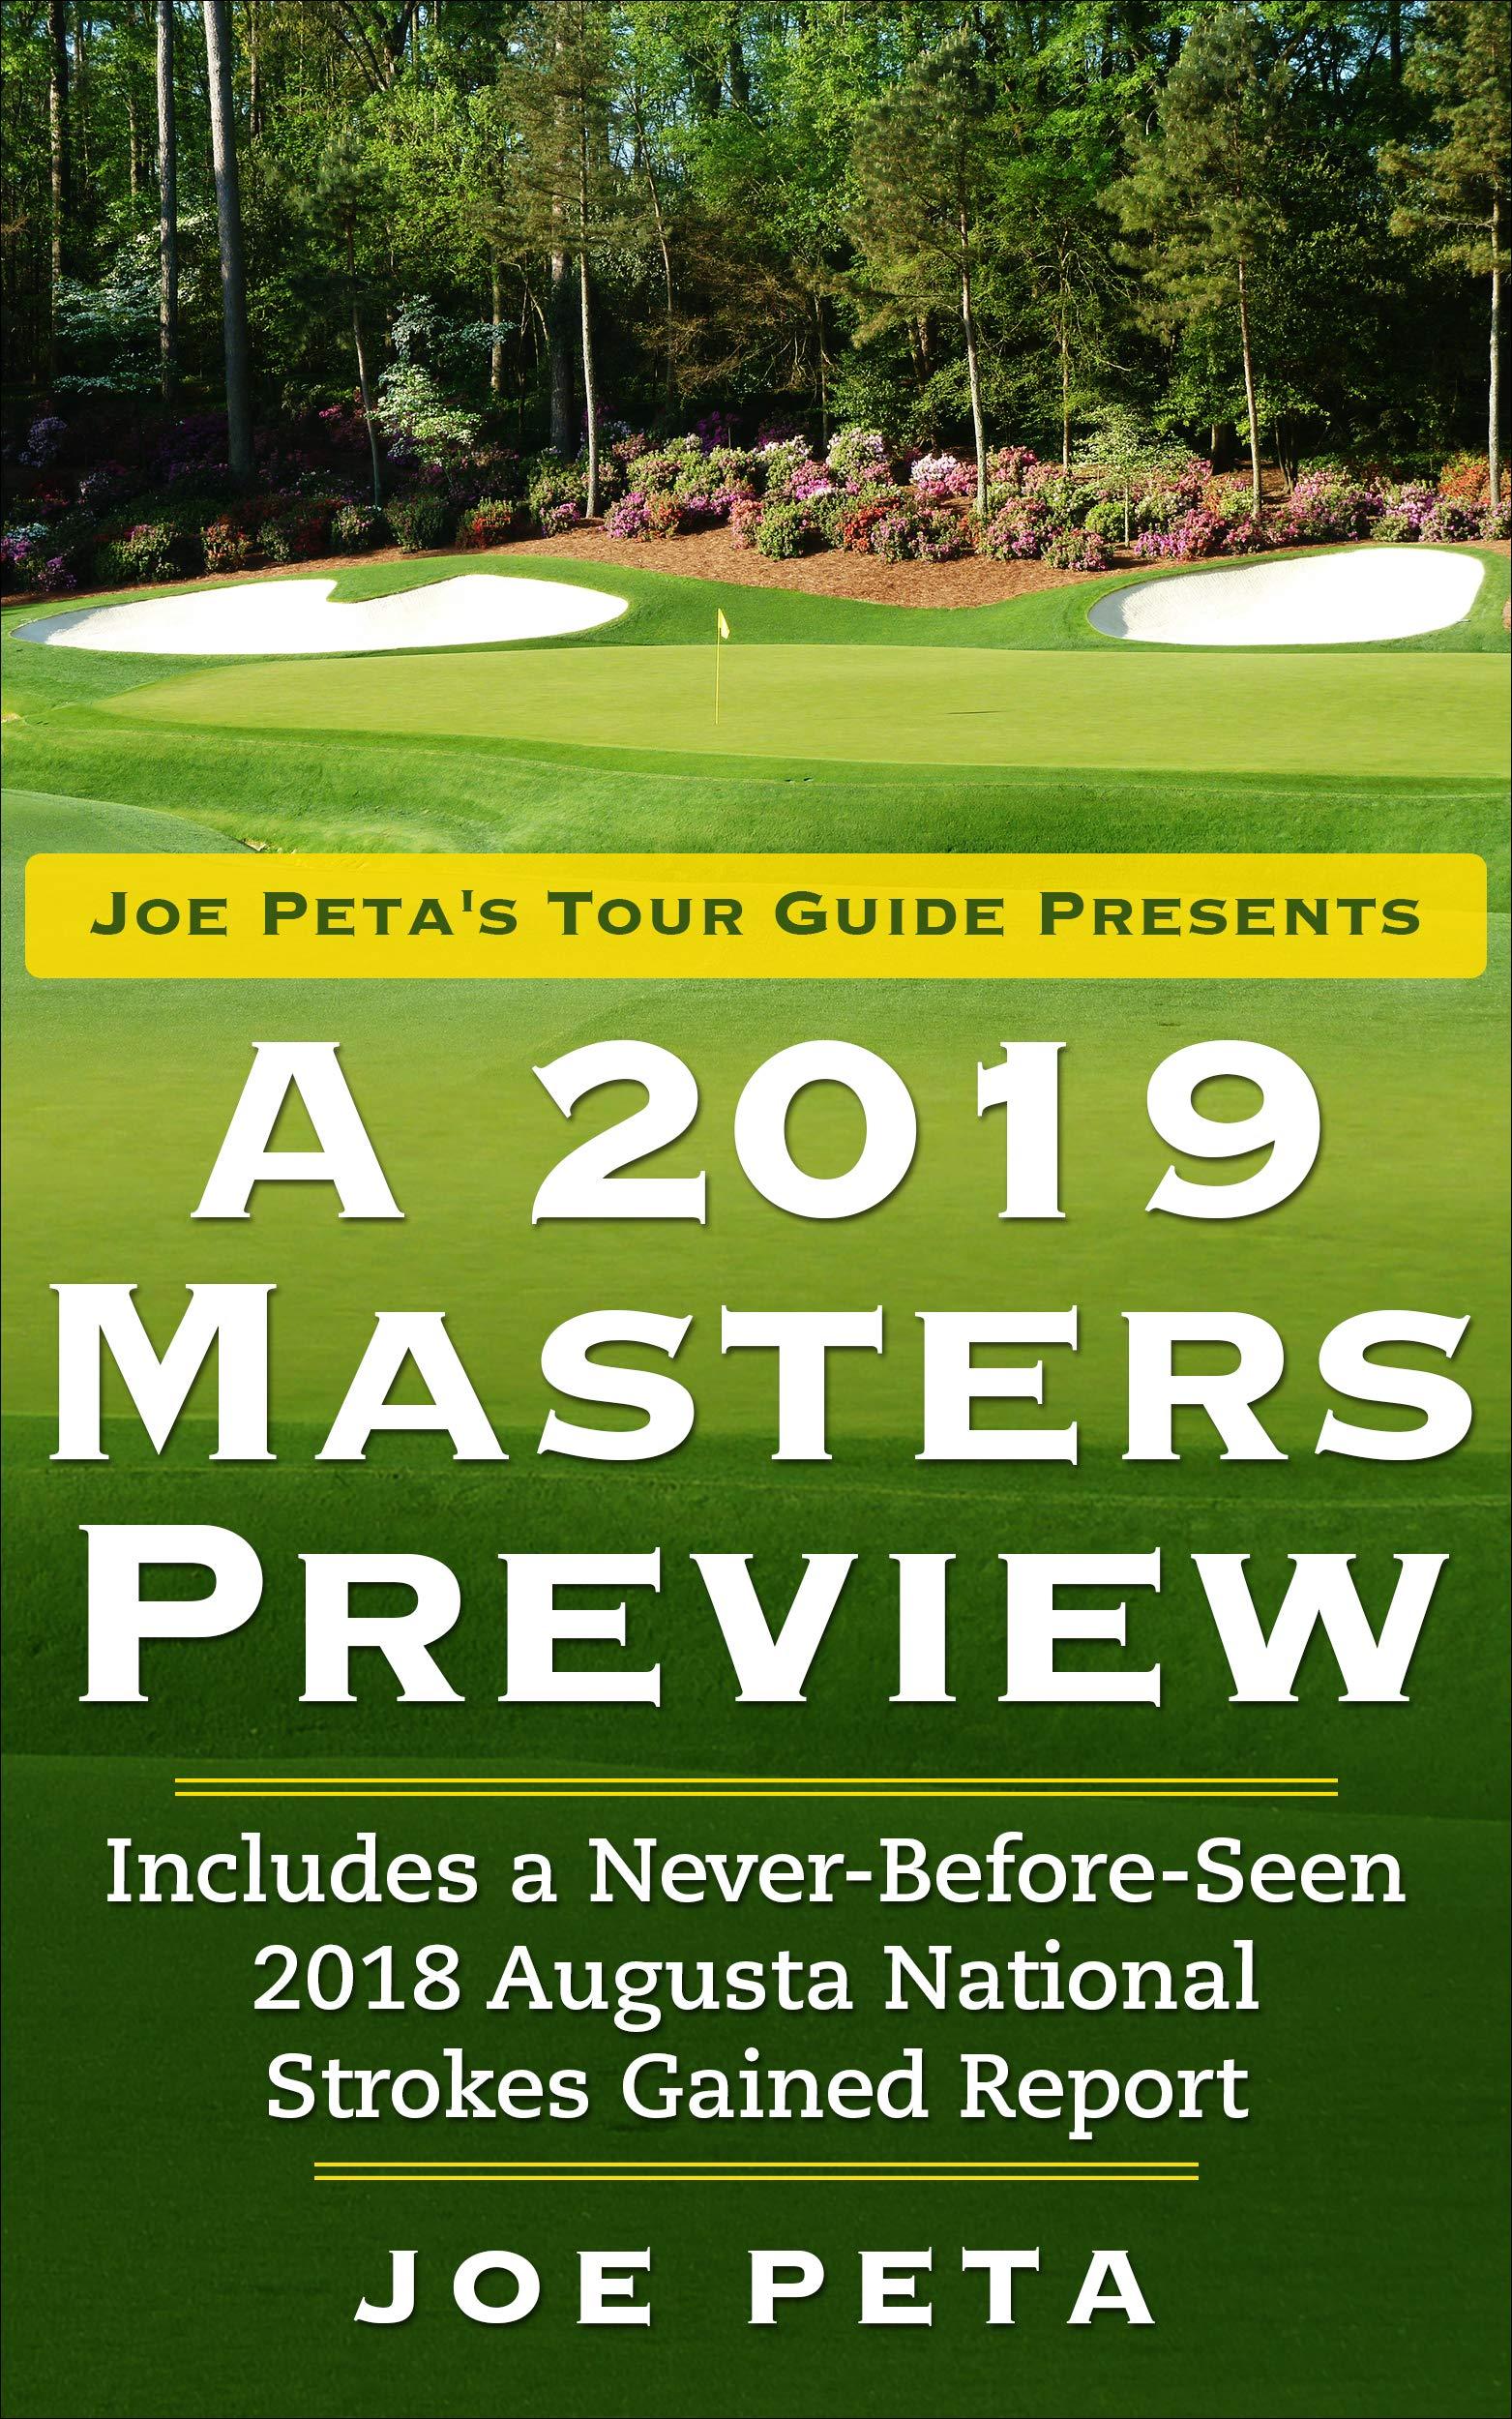 Joe Peta's Tour Guide Presents A 2019 Masters Preview por Joe Peta